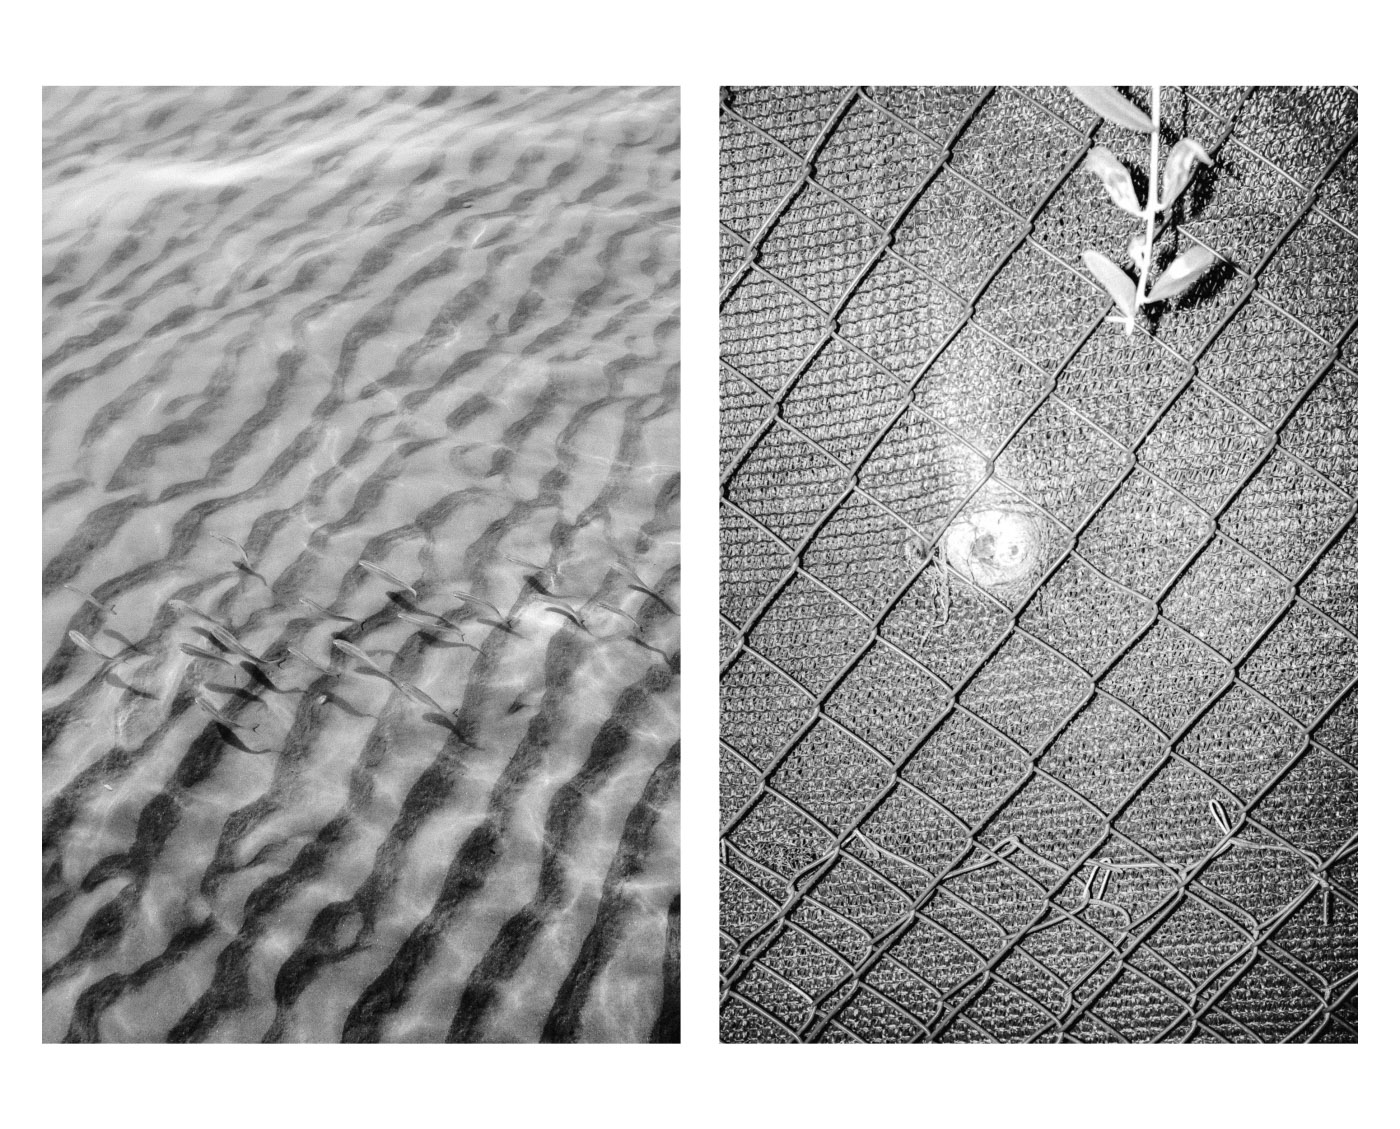 iGNANT-Photography-Antonio-Privitera-La-Nostalgia-08